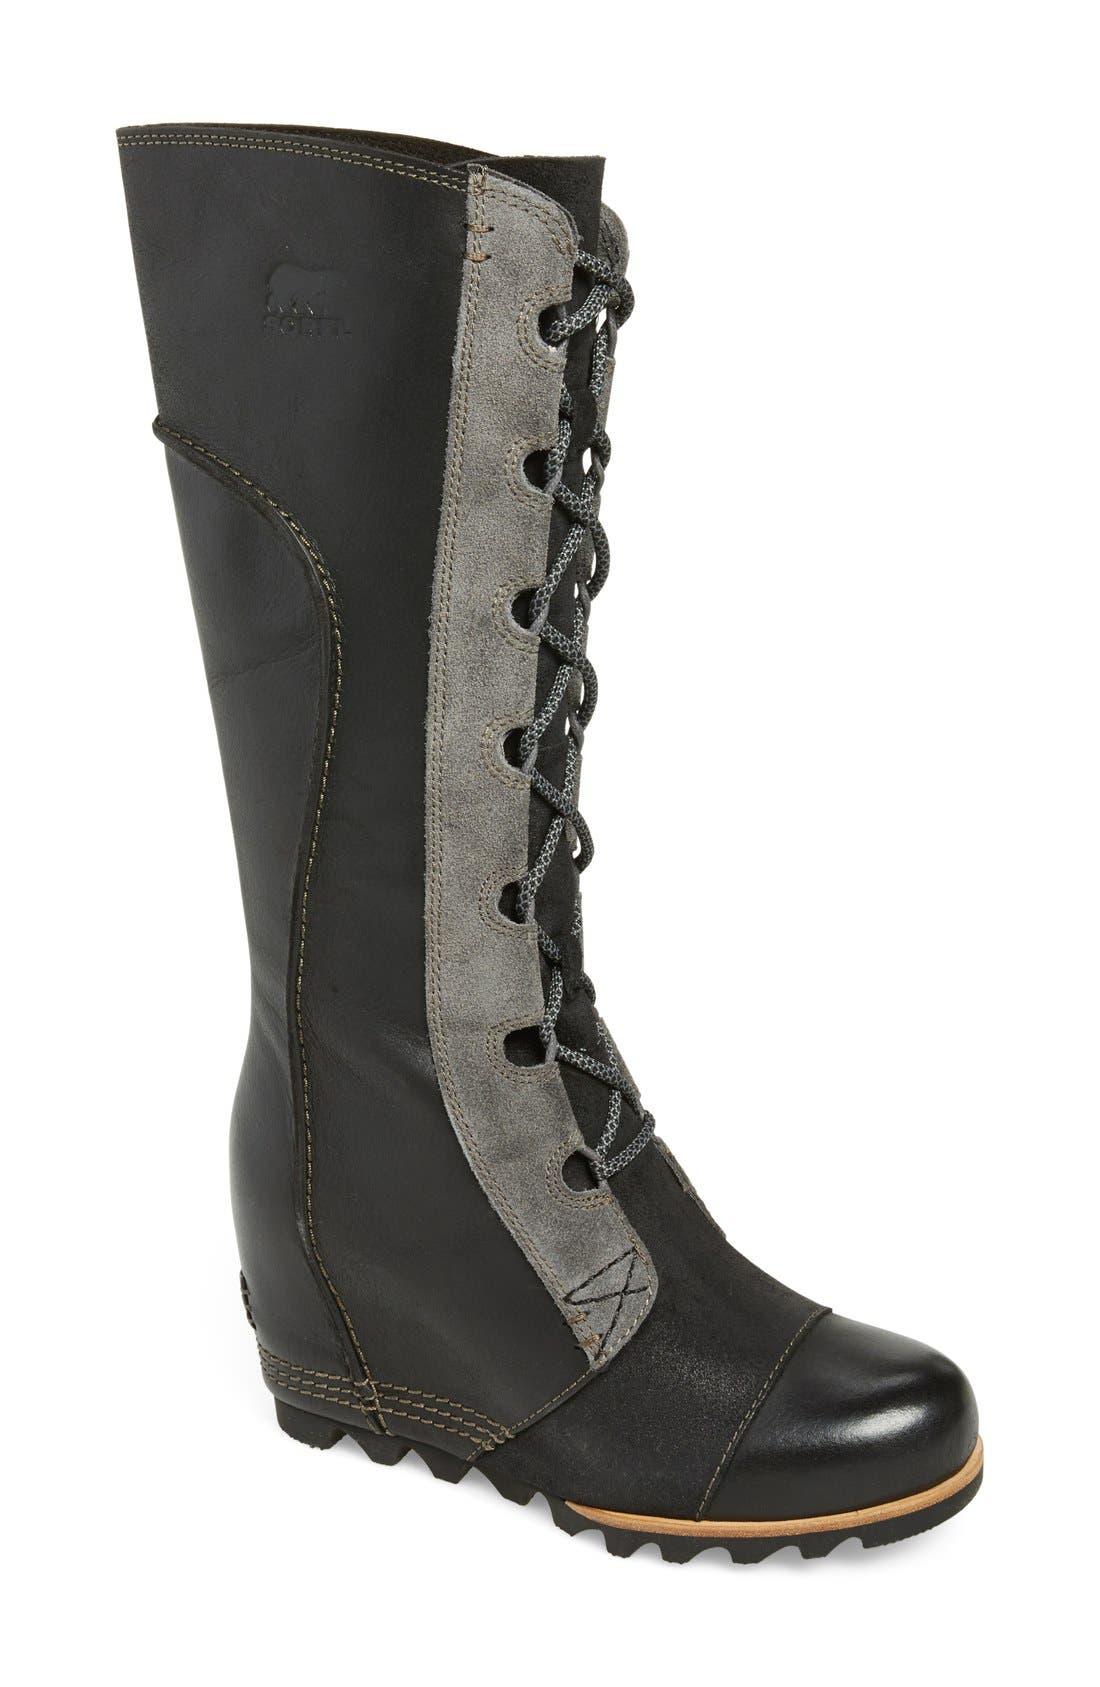 Alternate Image 1 Selected - SOREL 'Cate the Great' Waterproof Wedge Boot (Women)